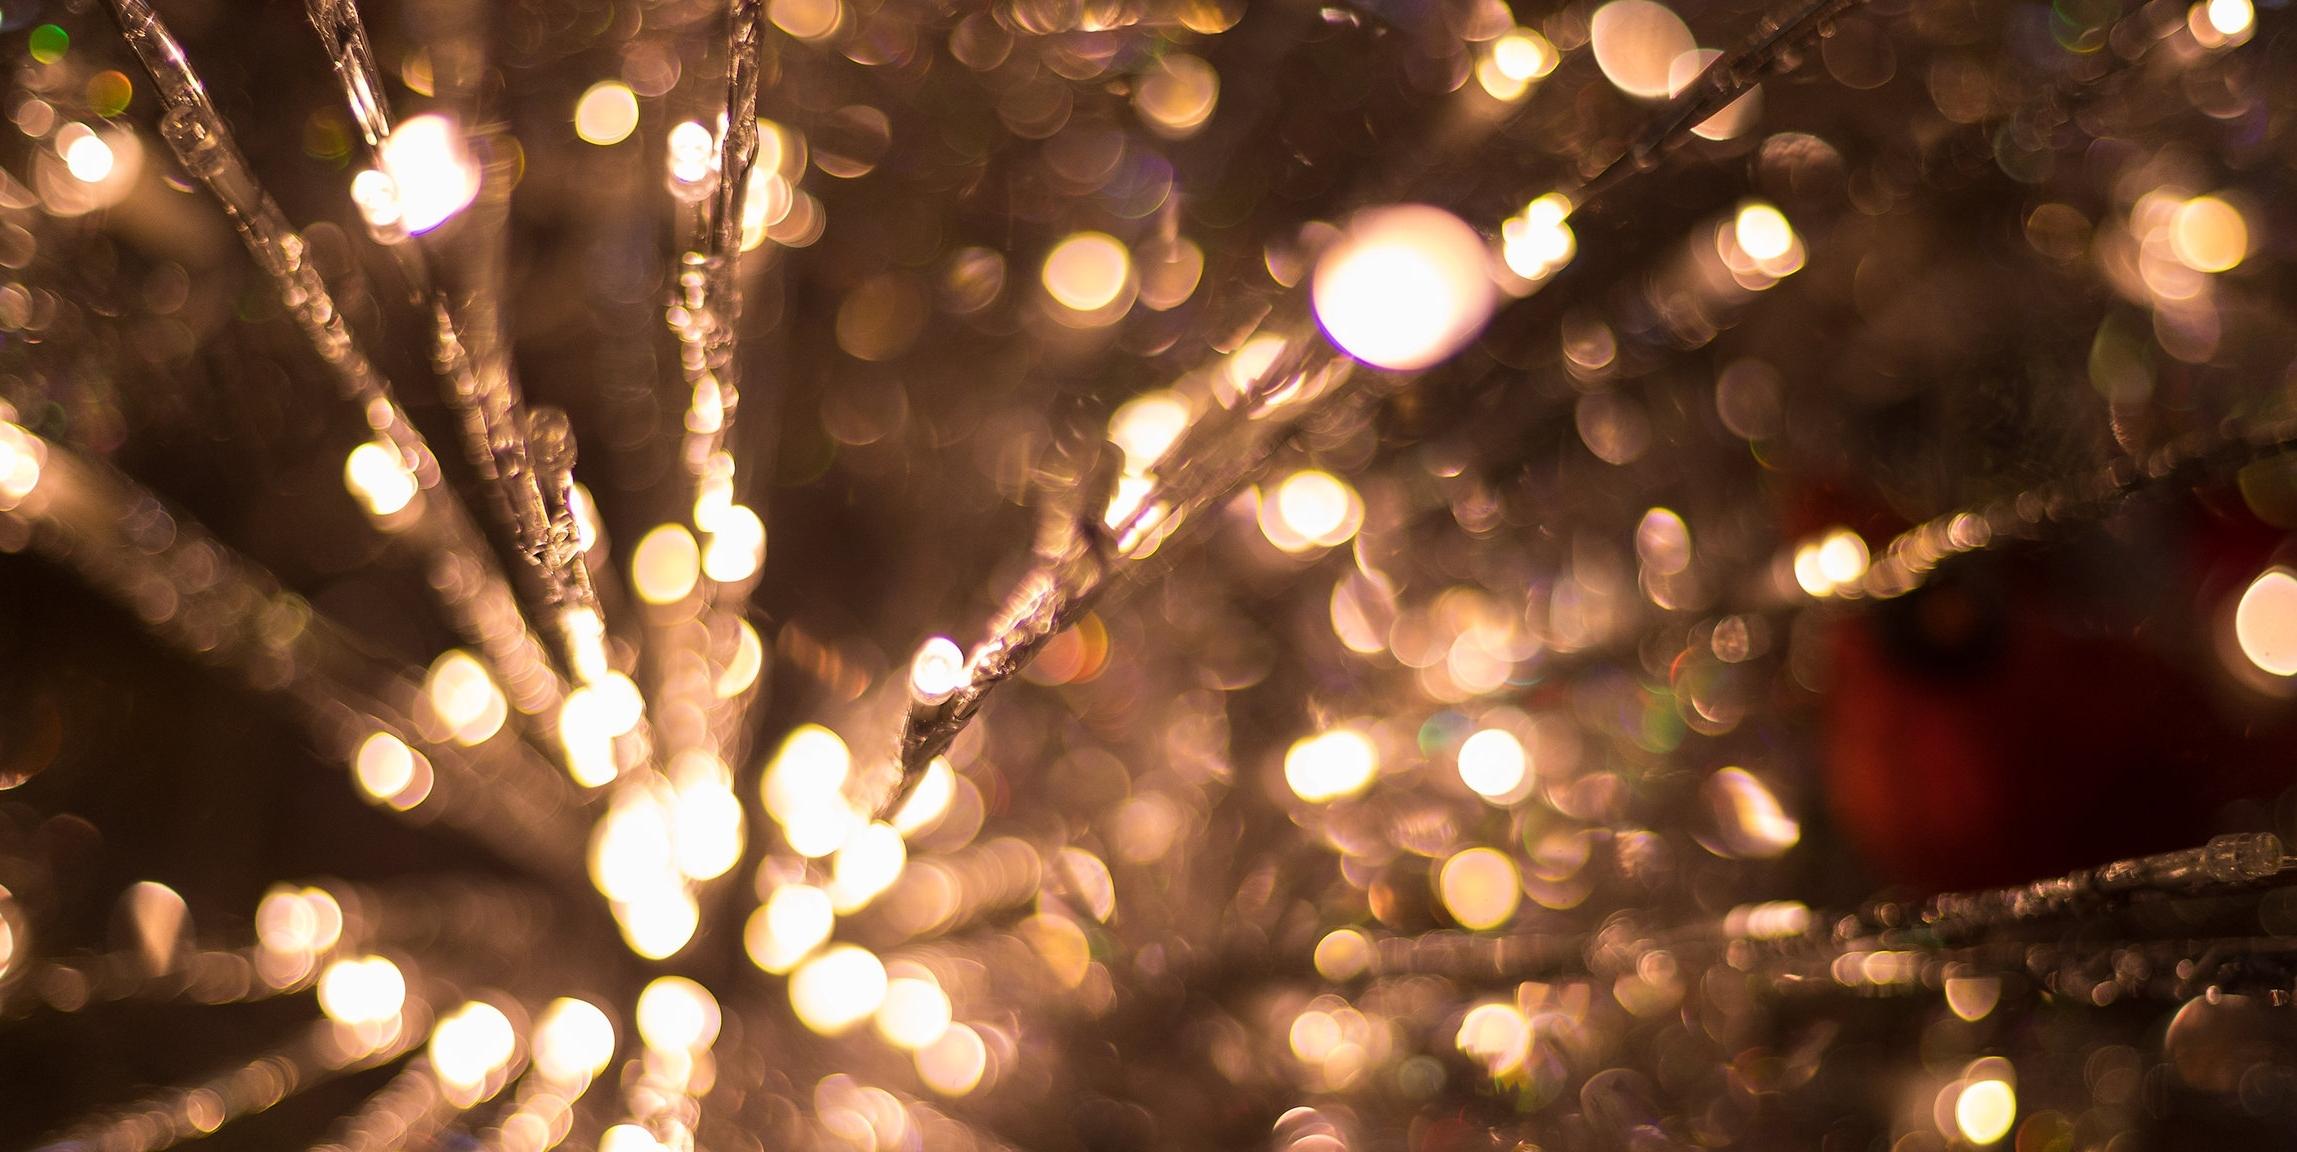 Starburst Lighting! We've got your lighting needs on lock